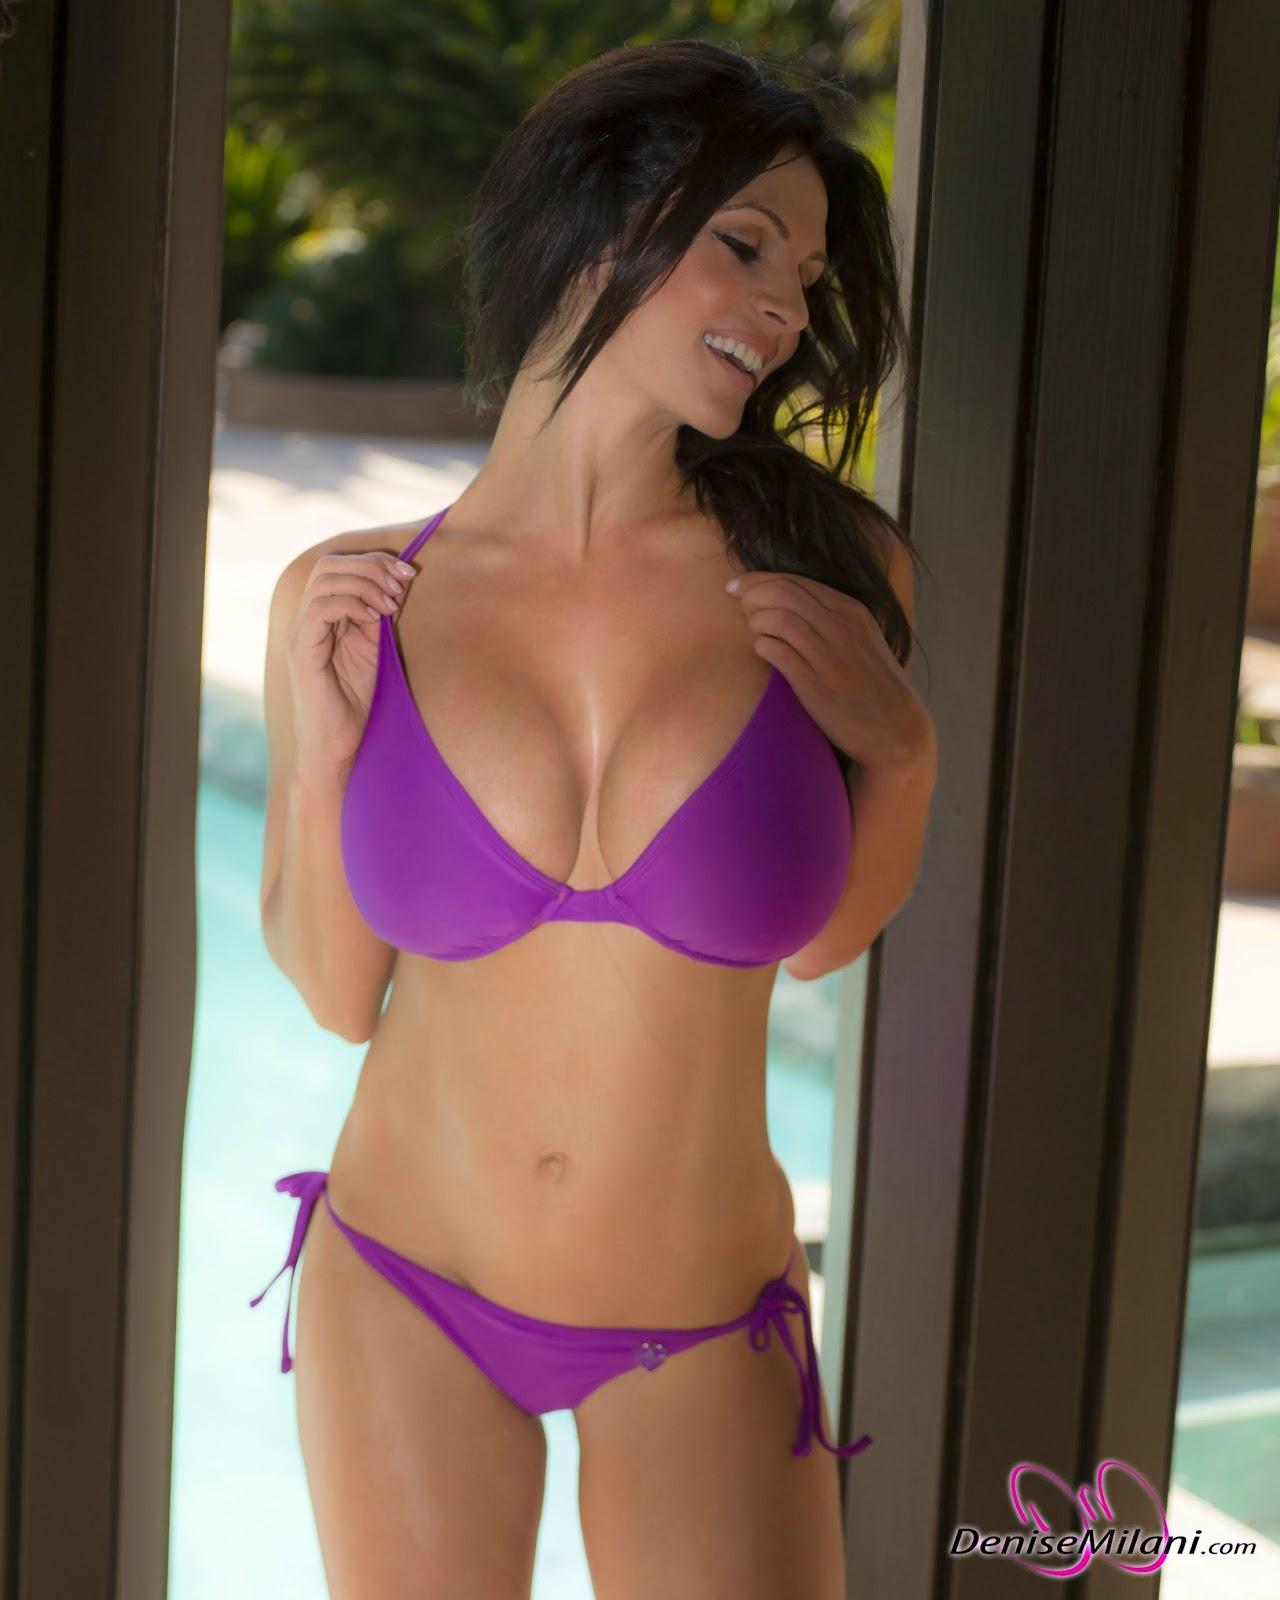 Denise Milani Swim Wear